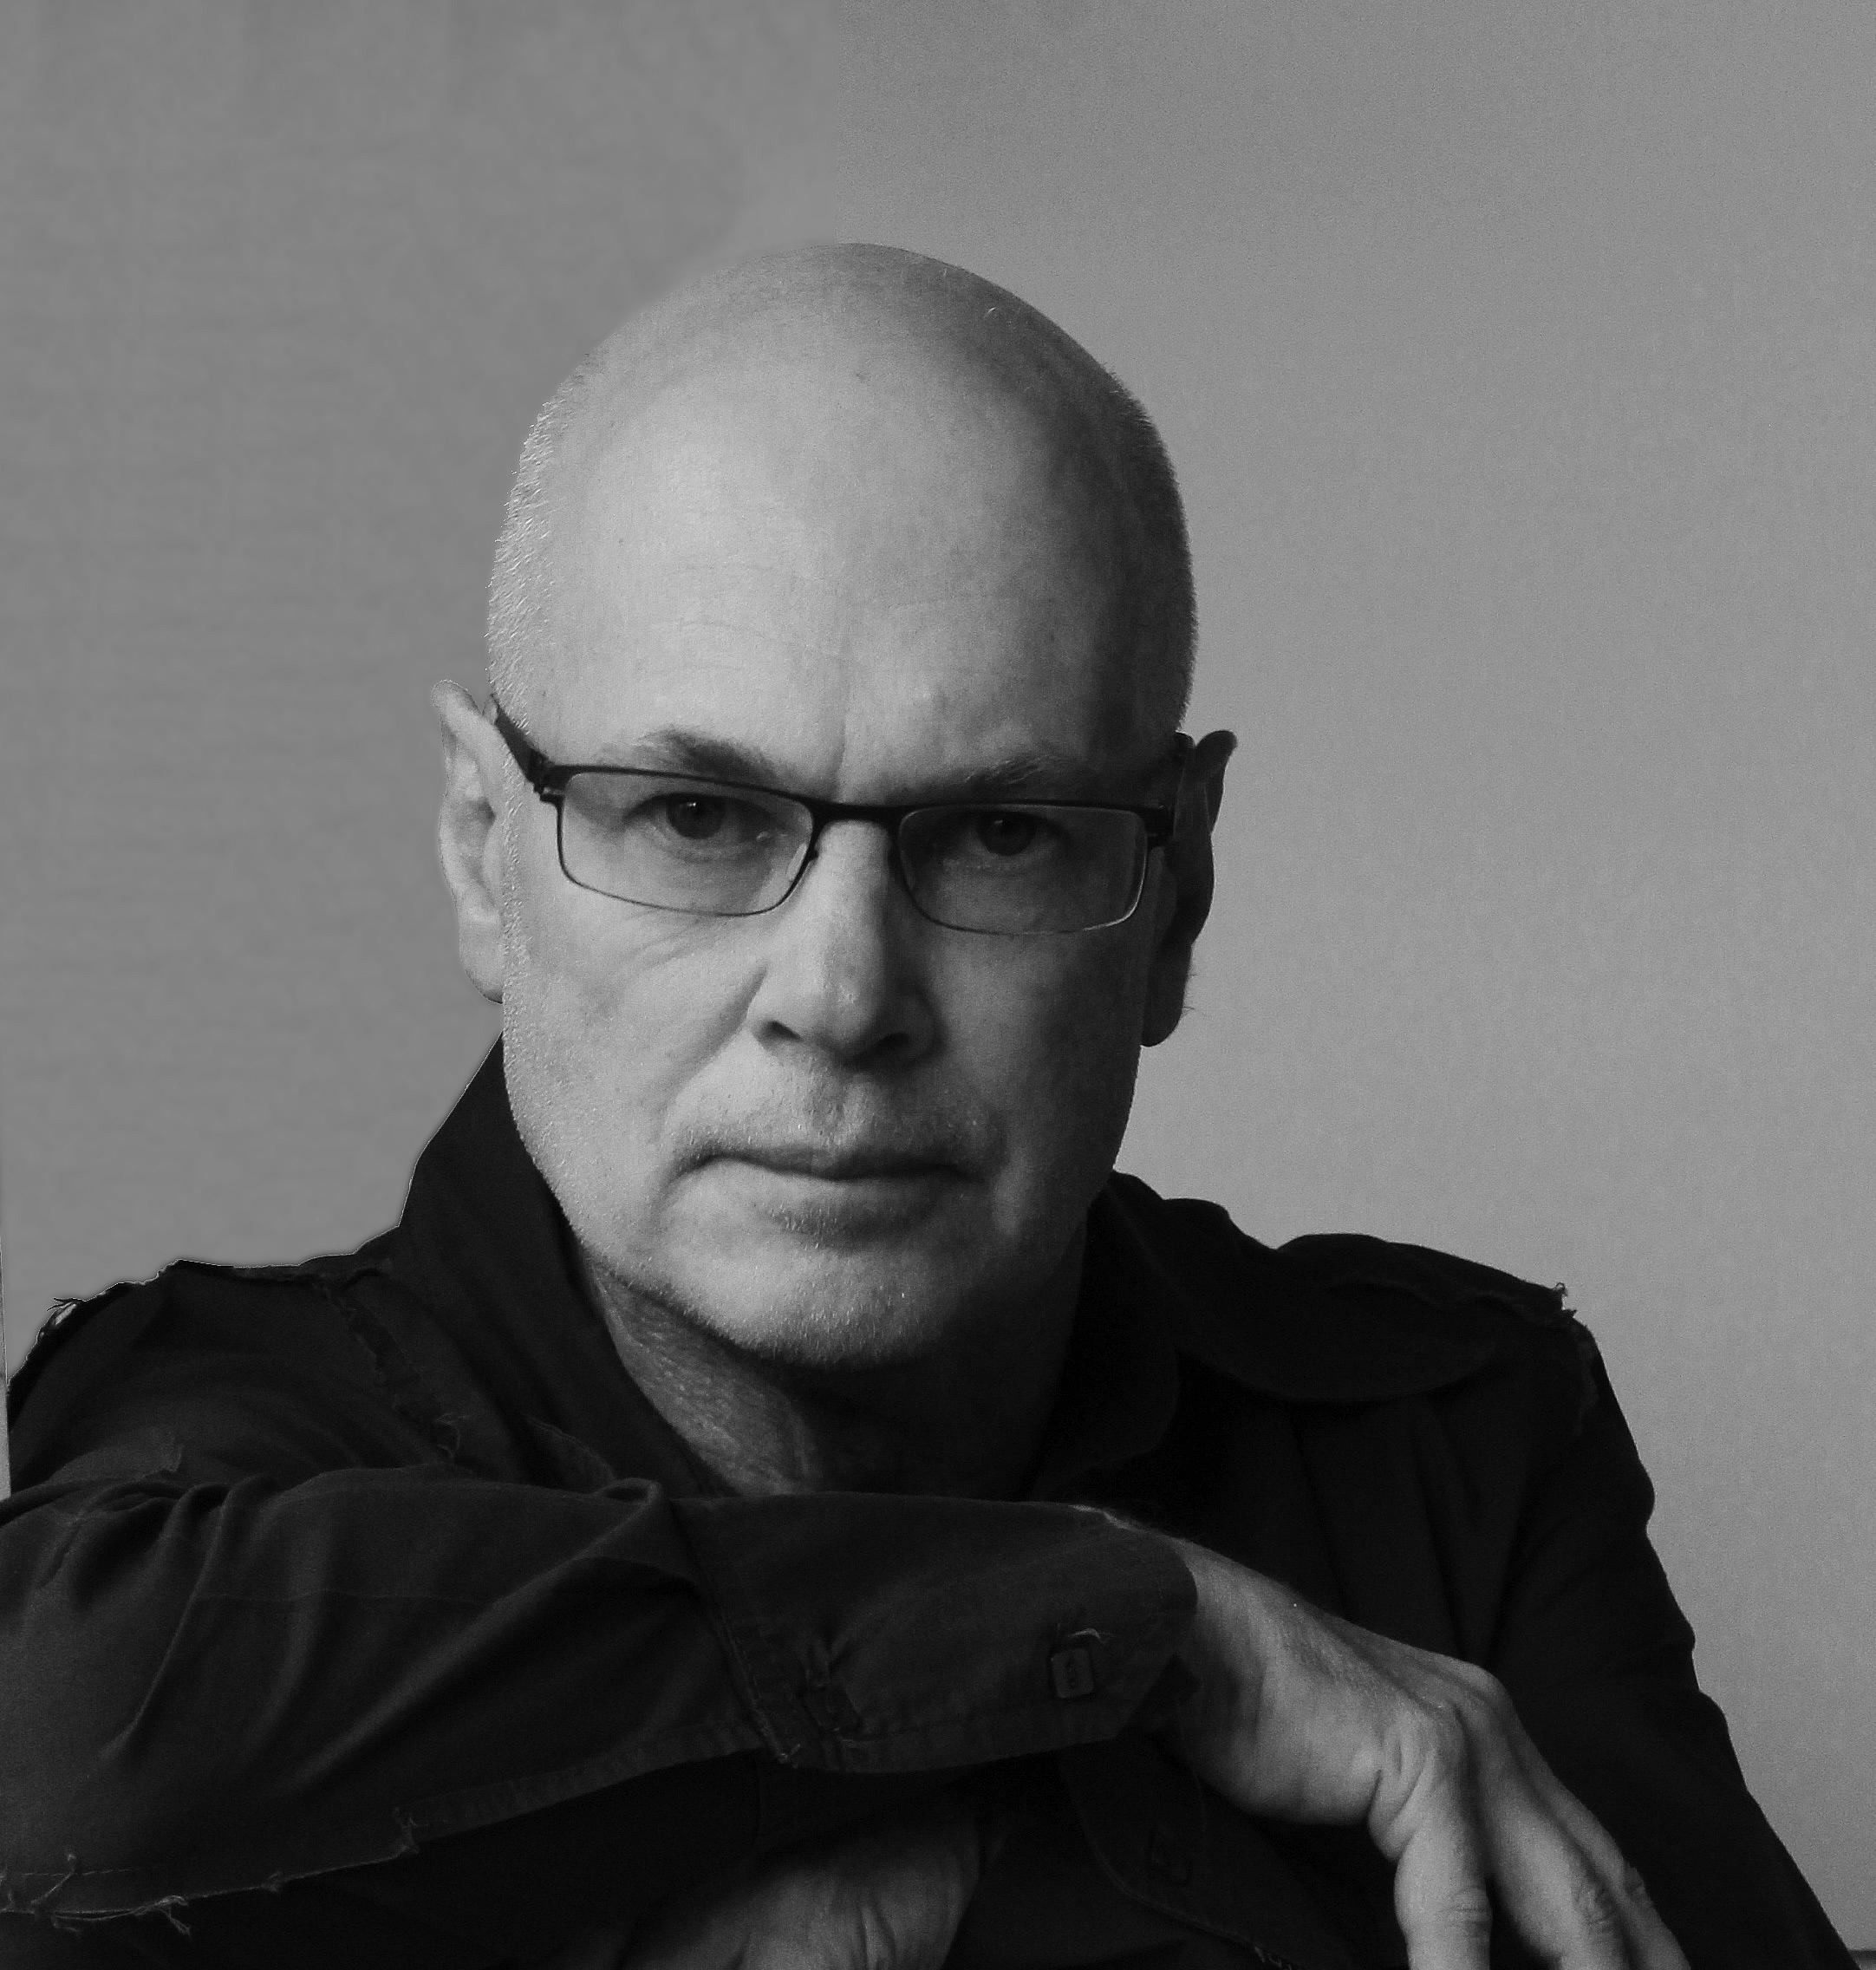 Paul Carstens